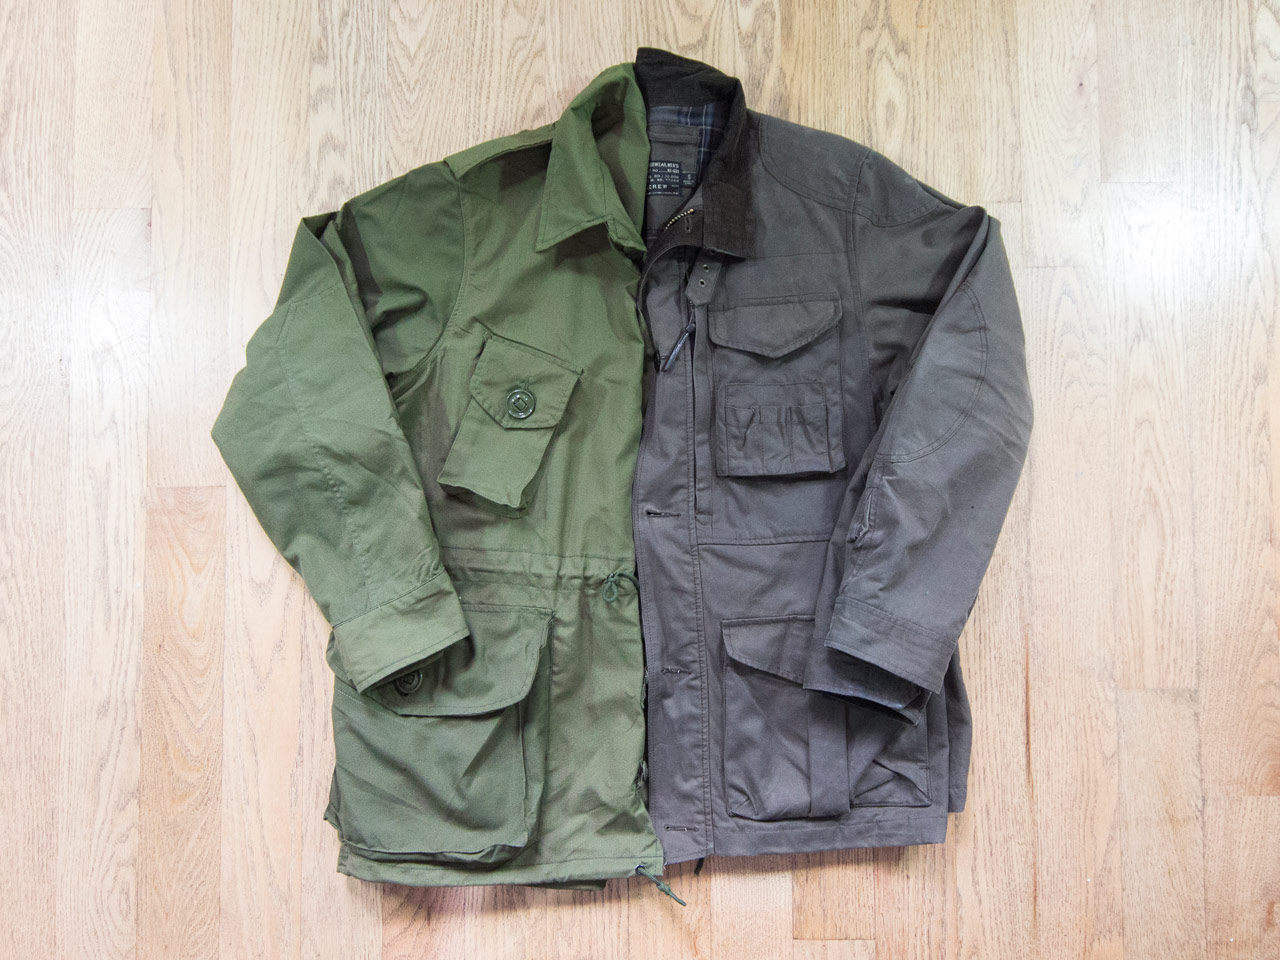 effortless essentials minimalist wardrobe - casual jackets